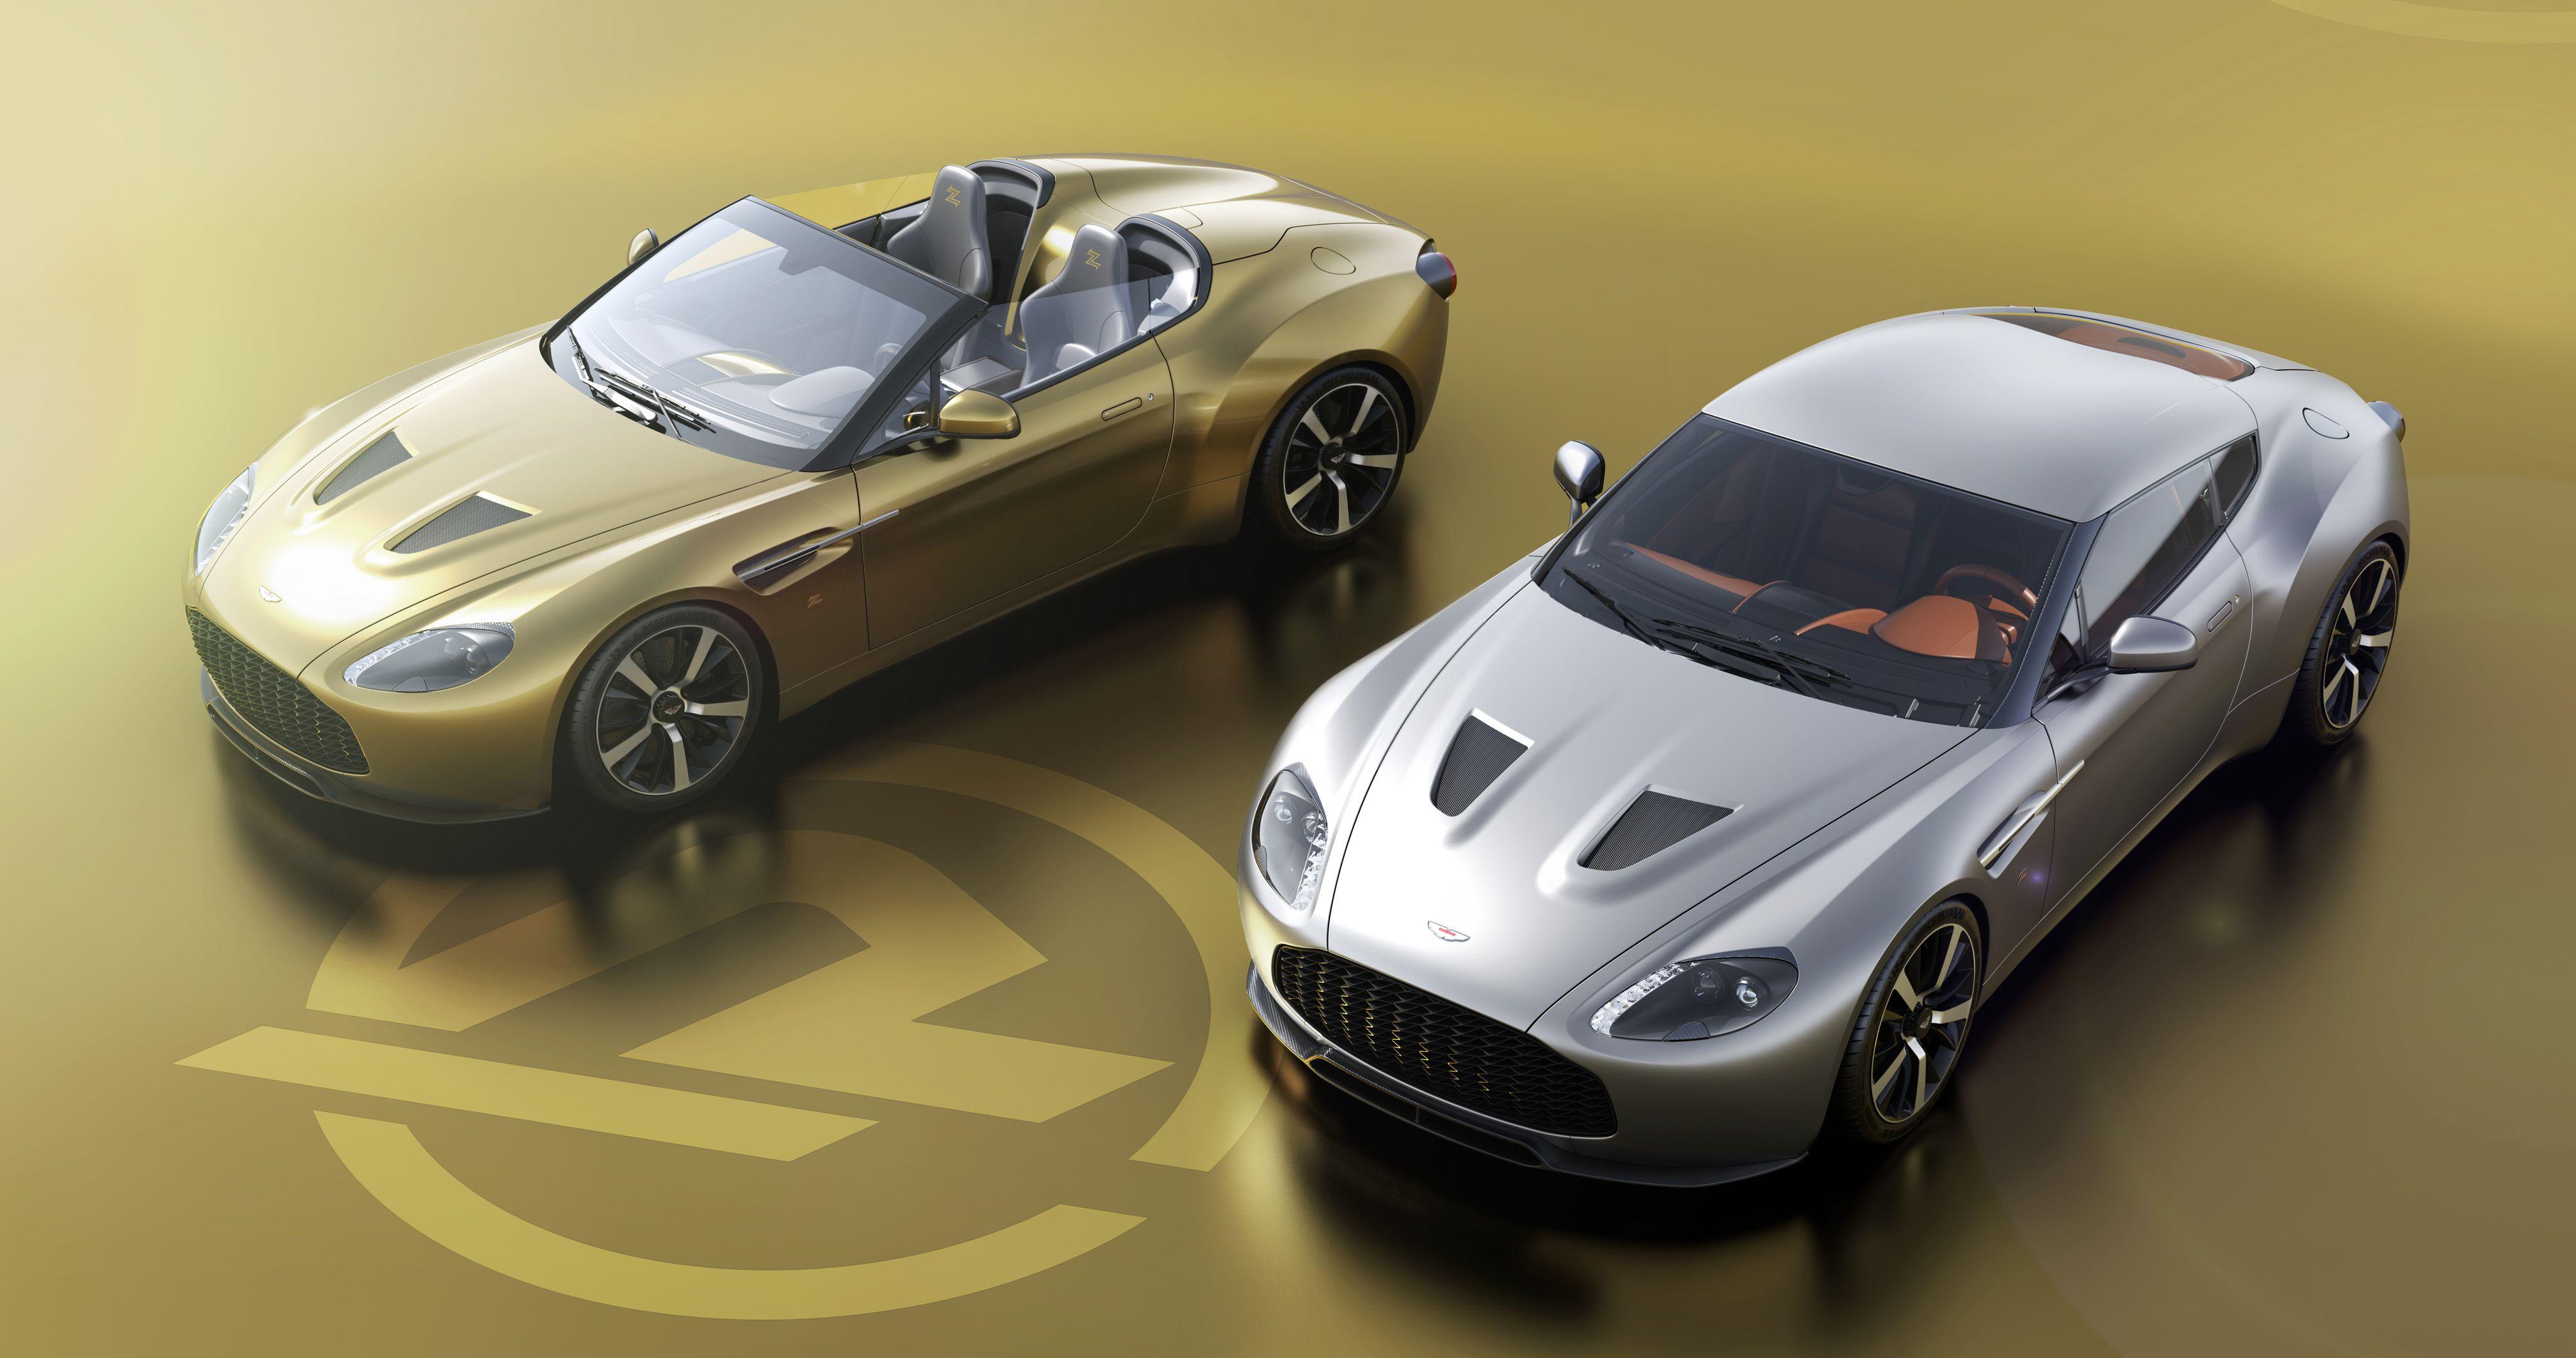 Aston Martin Vantage Zagato V12 Coupe Speedster Pair Revealed